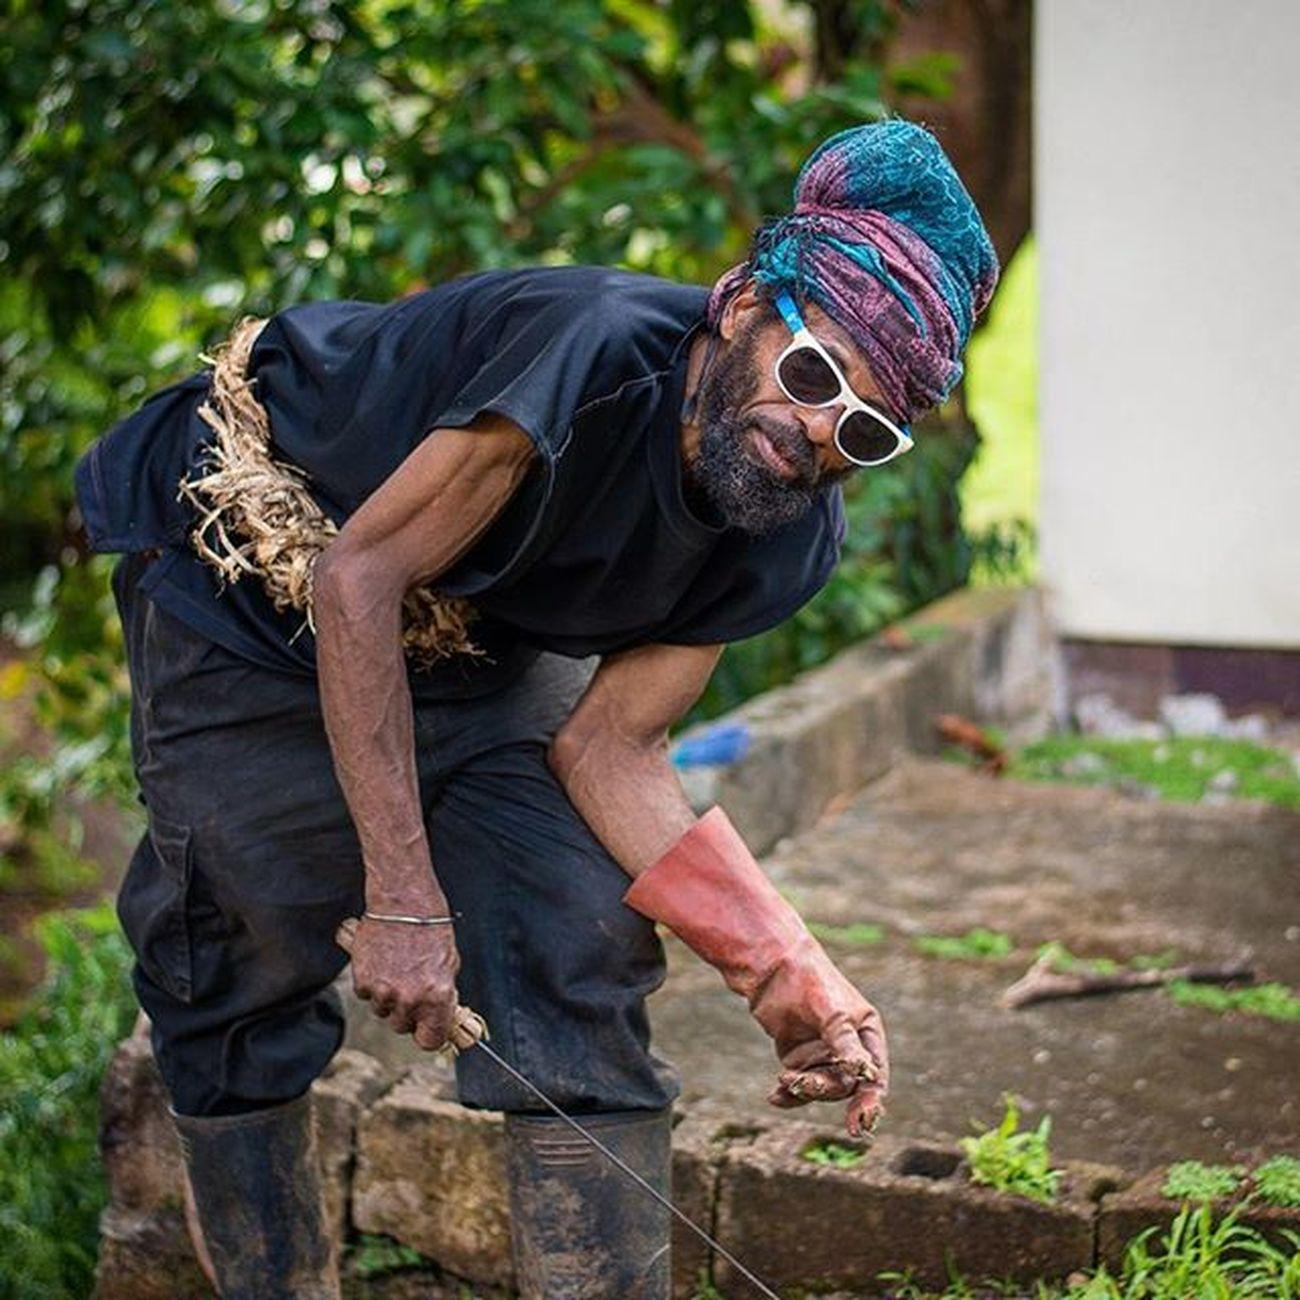 Grenada Rural_love IshootGND Andyjohnsonphotography Amazingphotohunter Ig_captures_people Ig_caribbean People Natgeo Ig_grenada Uncoveryours Westindies_landscape Udog_peopleandplaces Andyjohnsonphotography